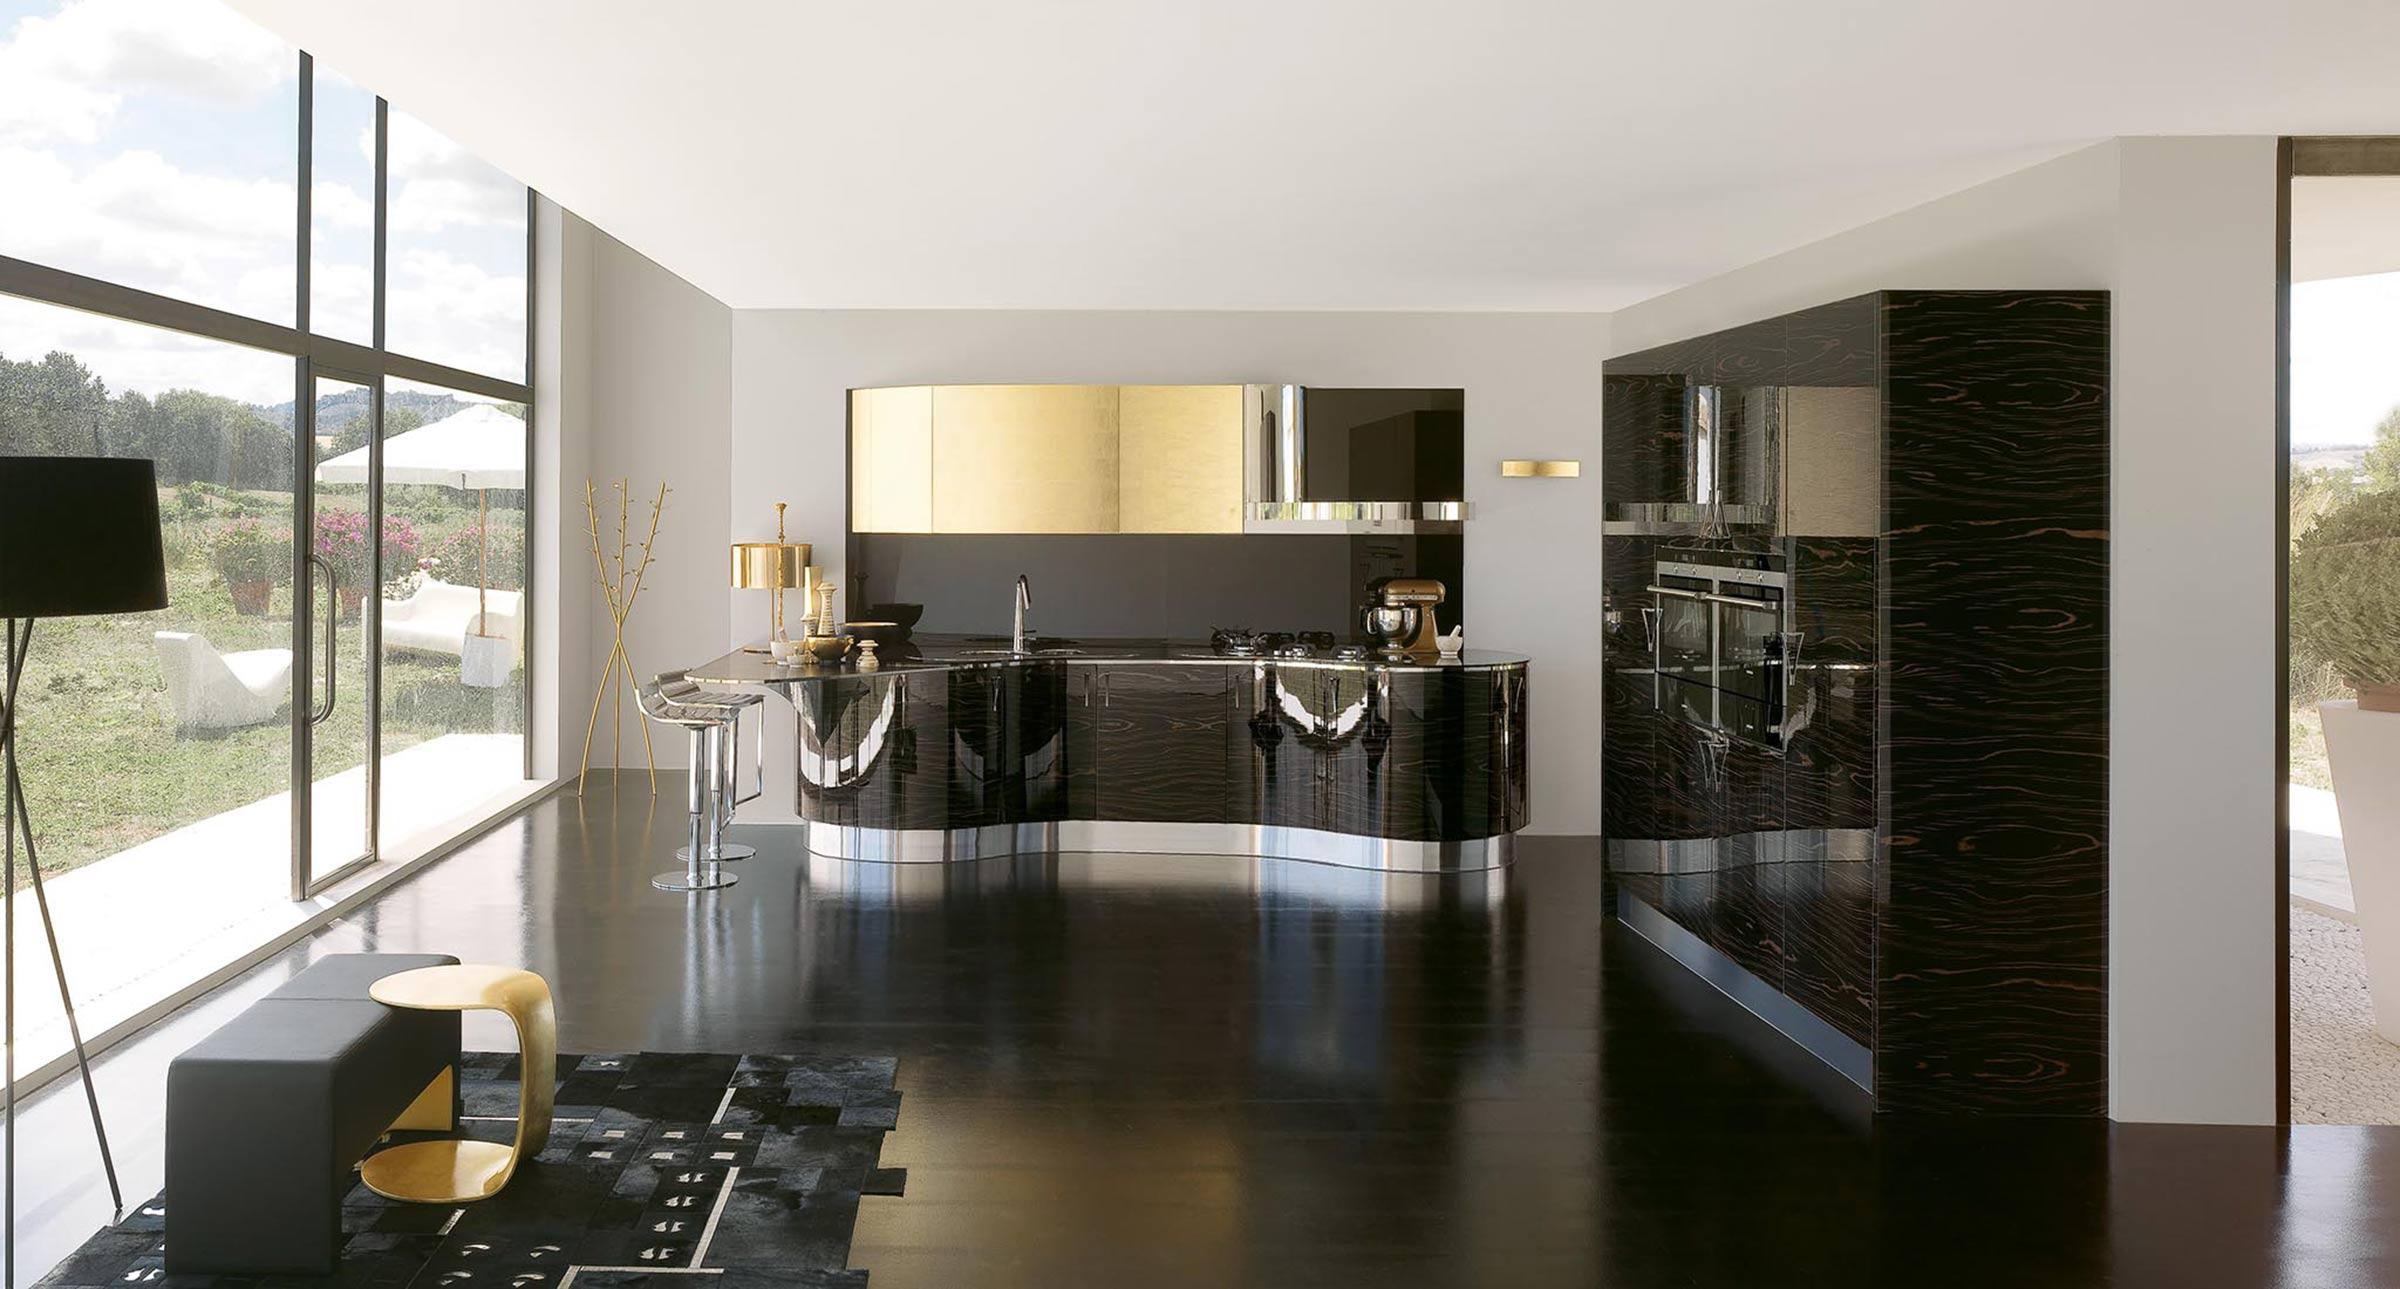 cuisines haut de gamme lyon les cuisines d arno. Black Bedroom Furniture Sets. Home Design Ideas